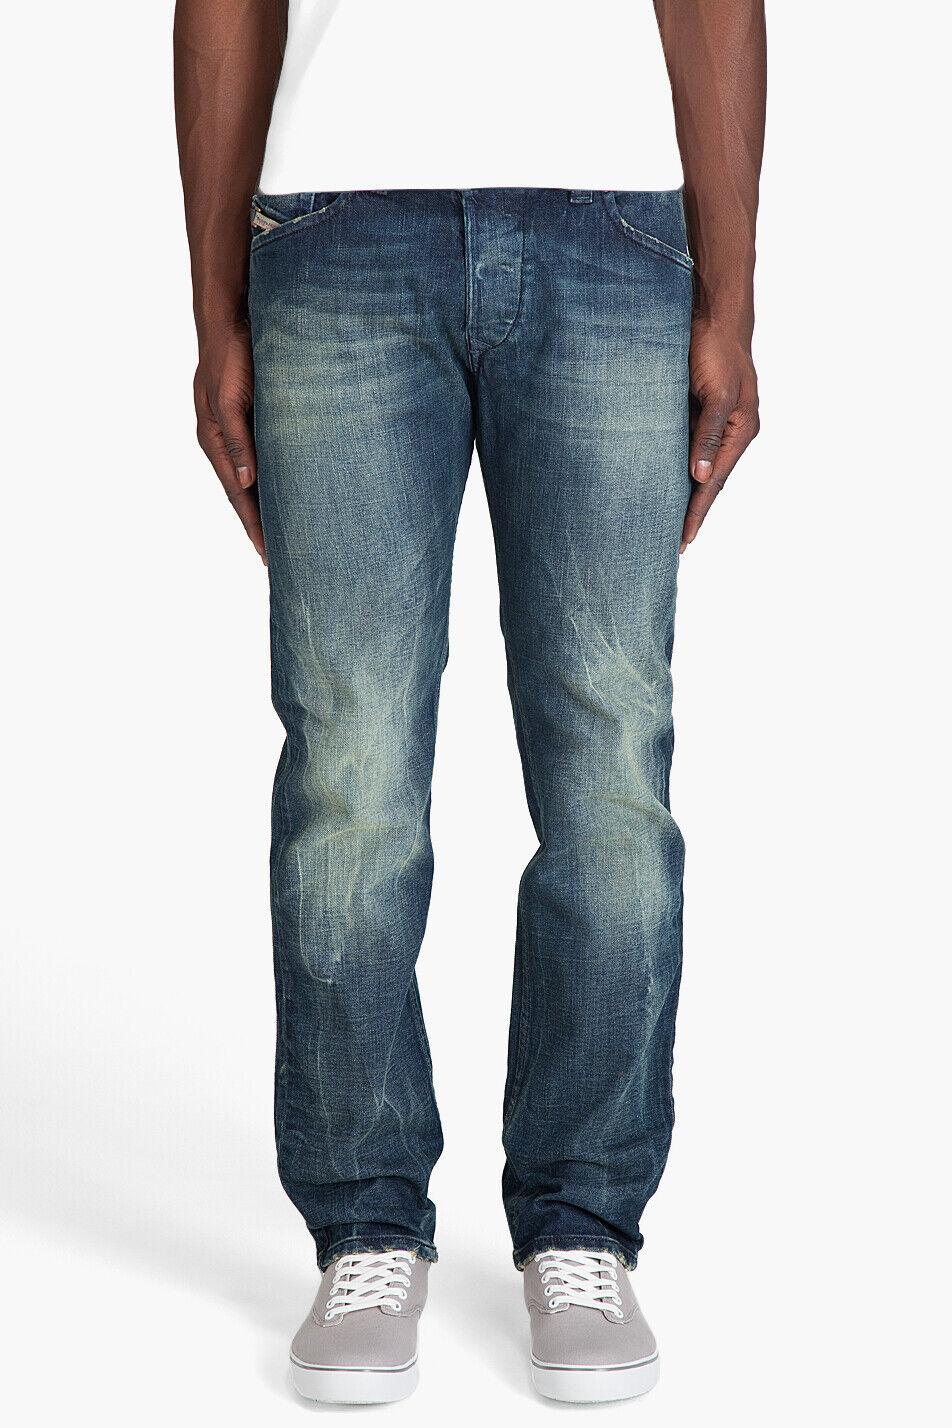 New Diesel Darron 8M9_Stretch Regular Slim Tapered Leg Jeans 28 32 NWT